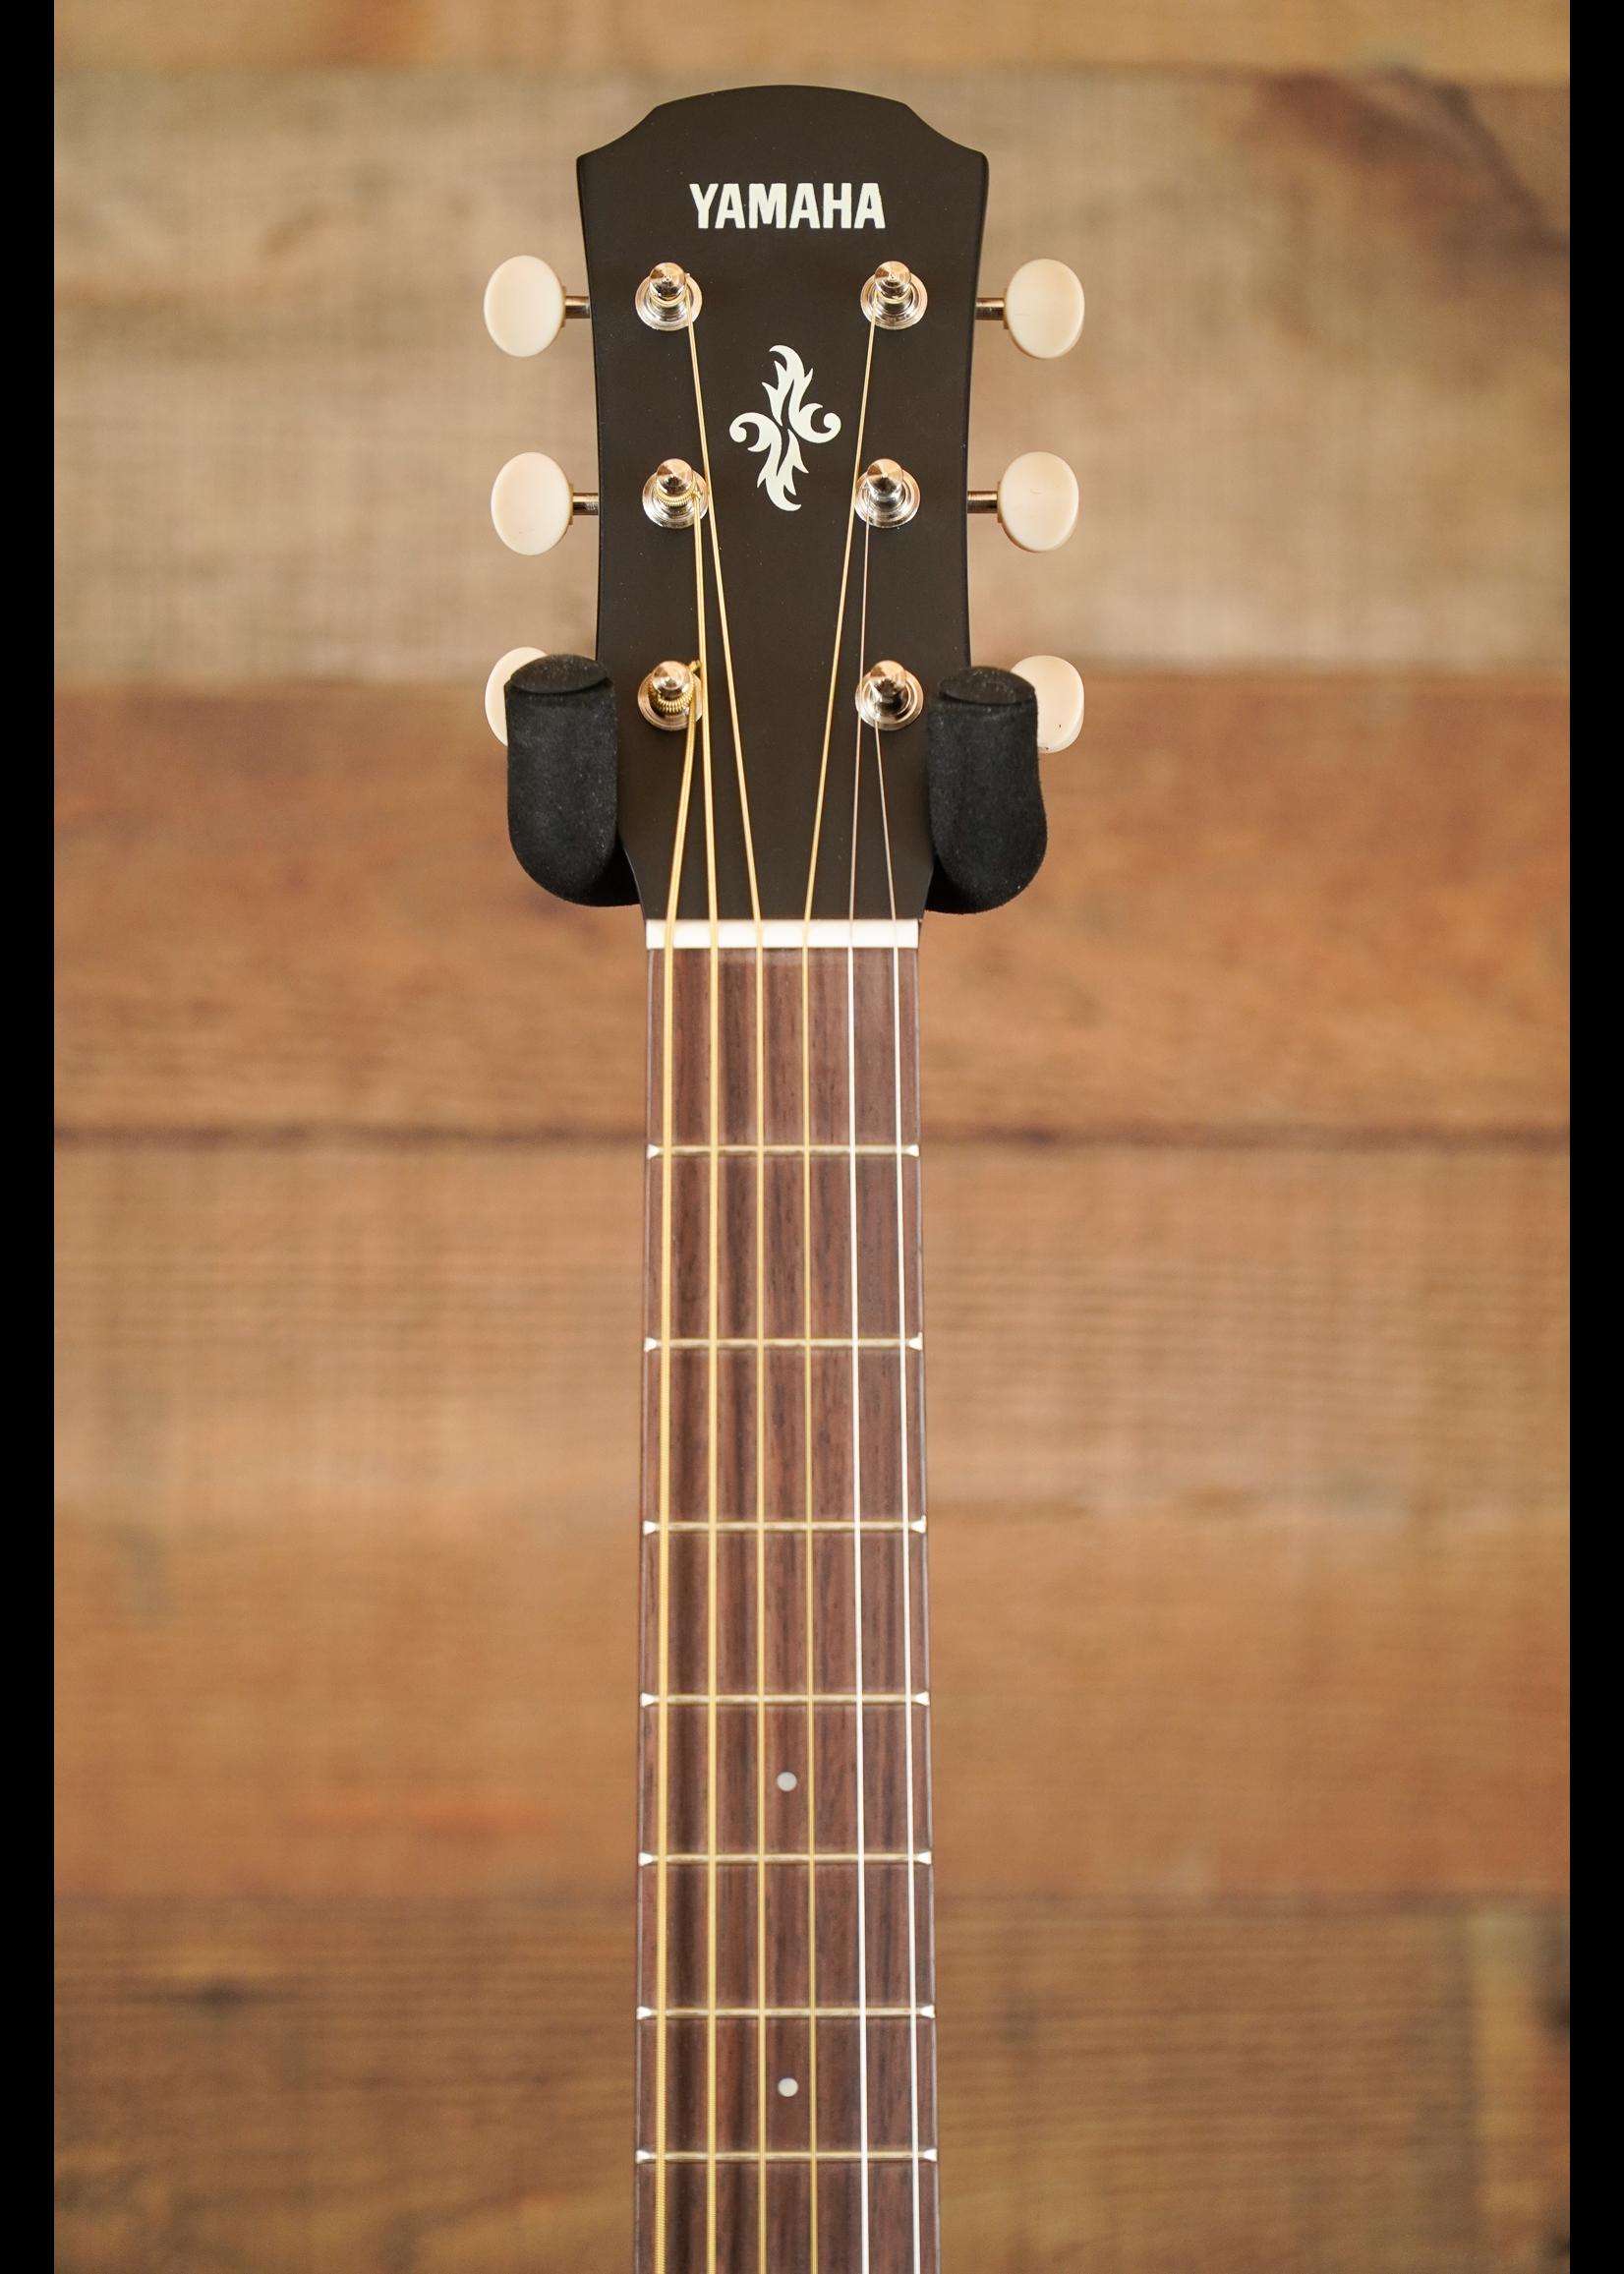 Yamaha Yamaha APXT2 Old Violin Sunburst